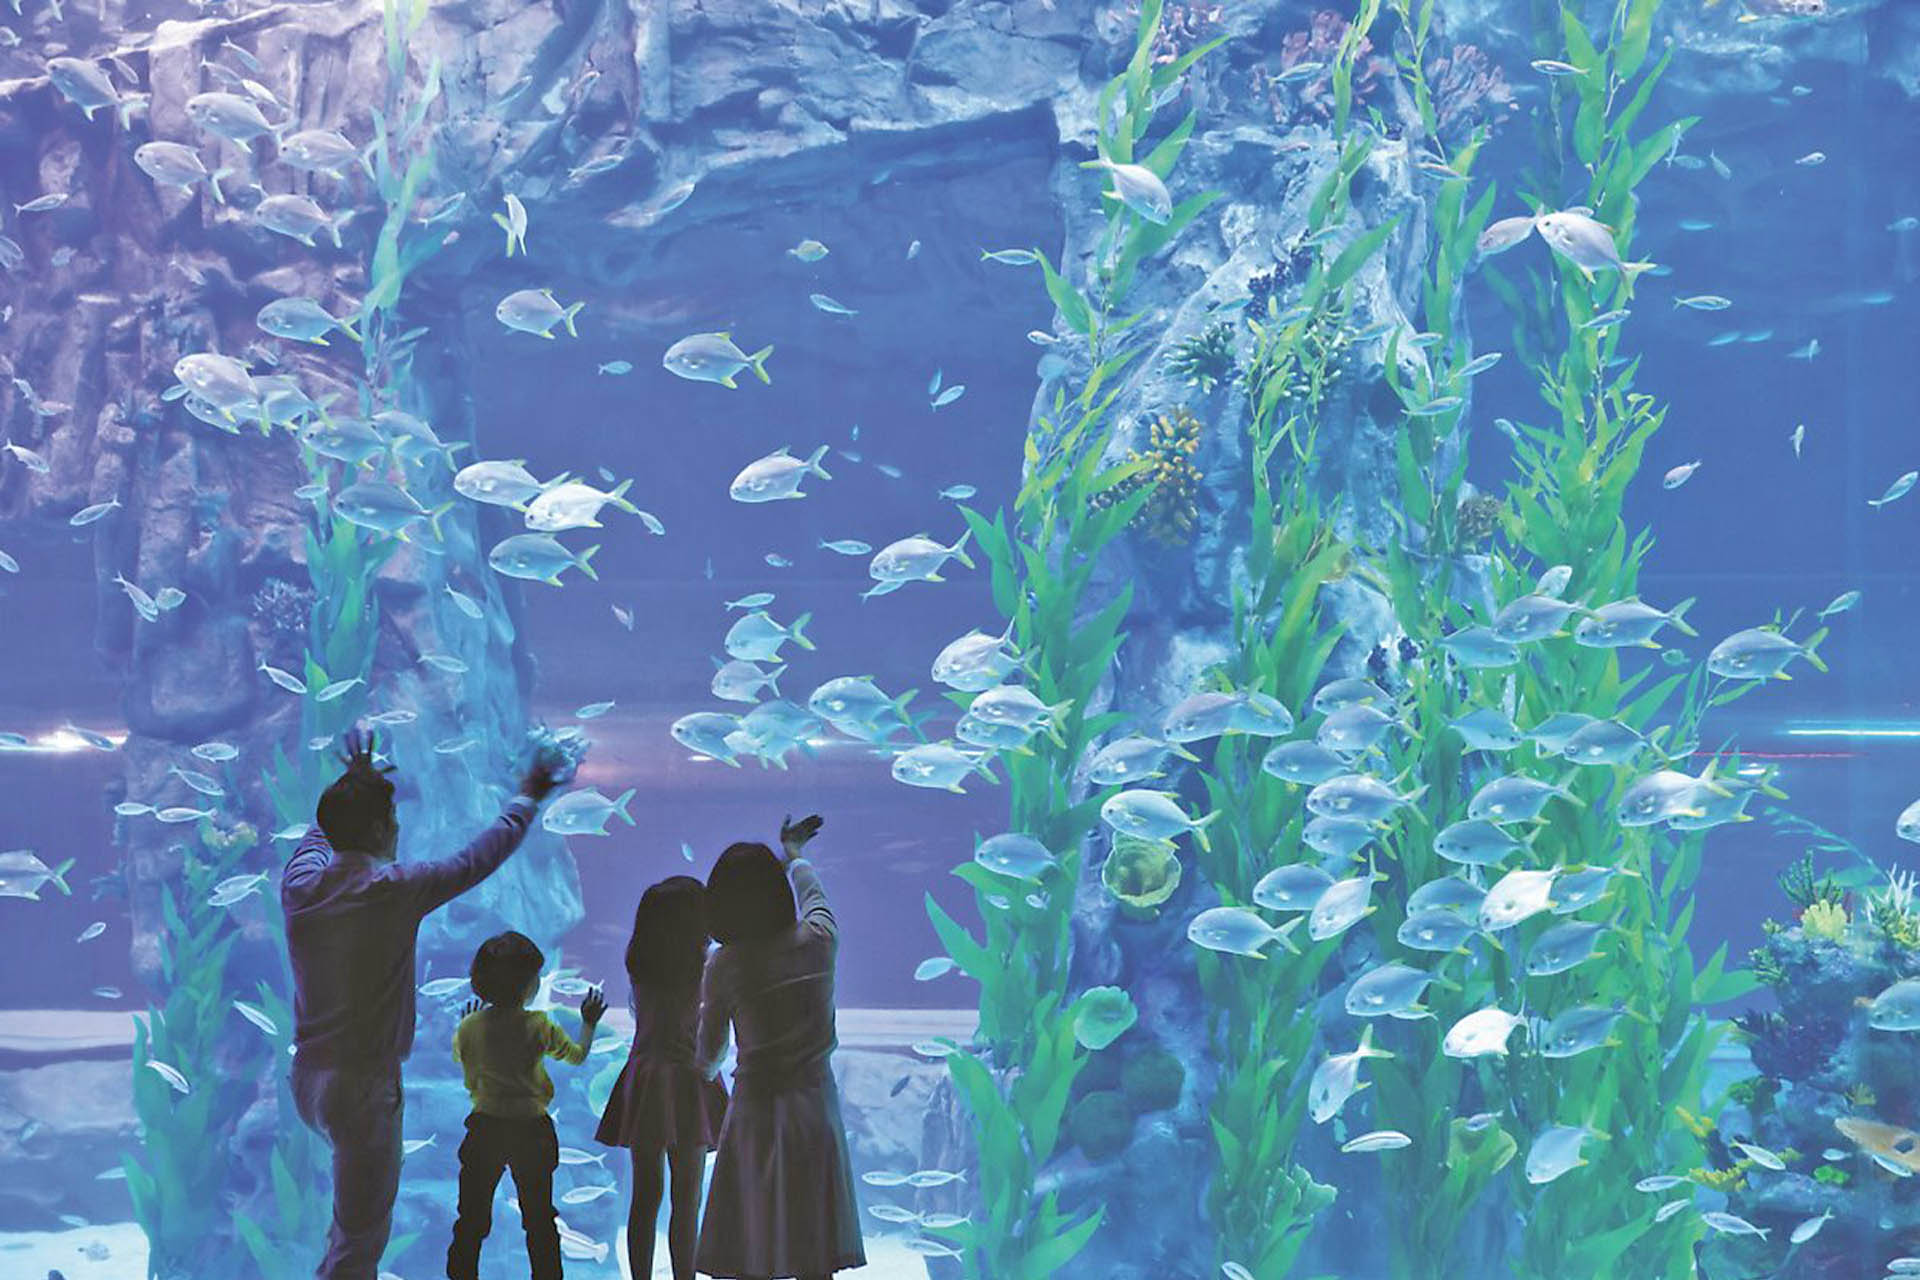 Lotte World Adventure Aquarium Day Pass Discount Tickets